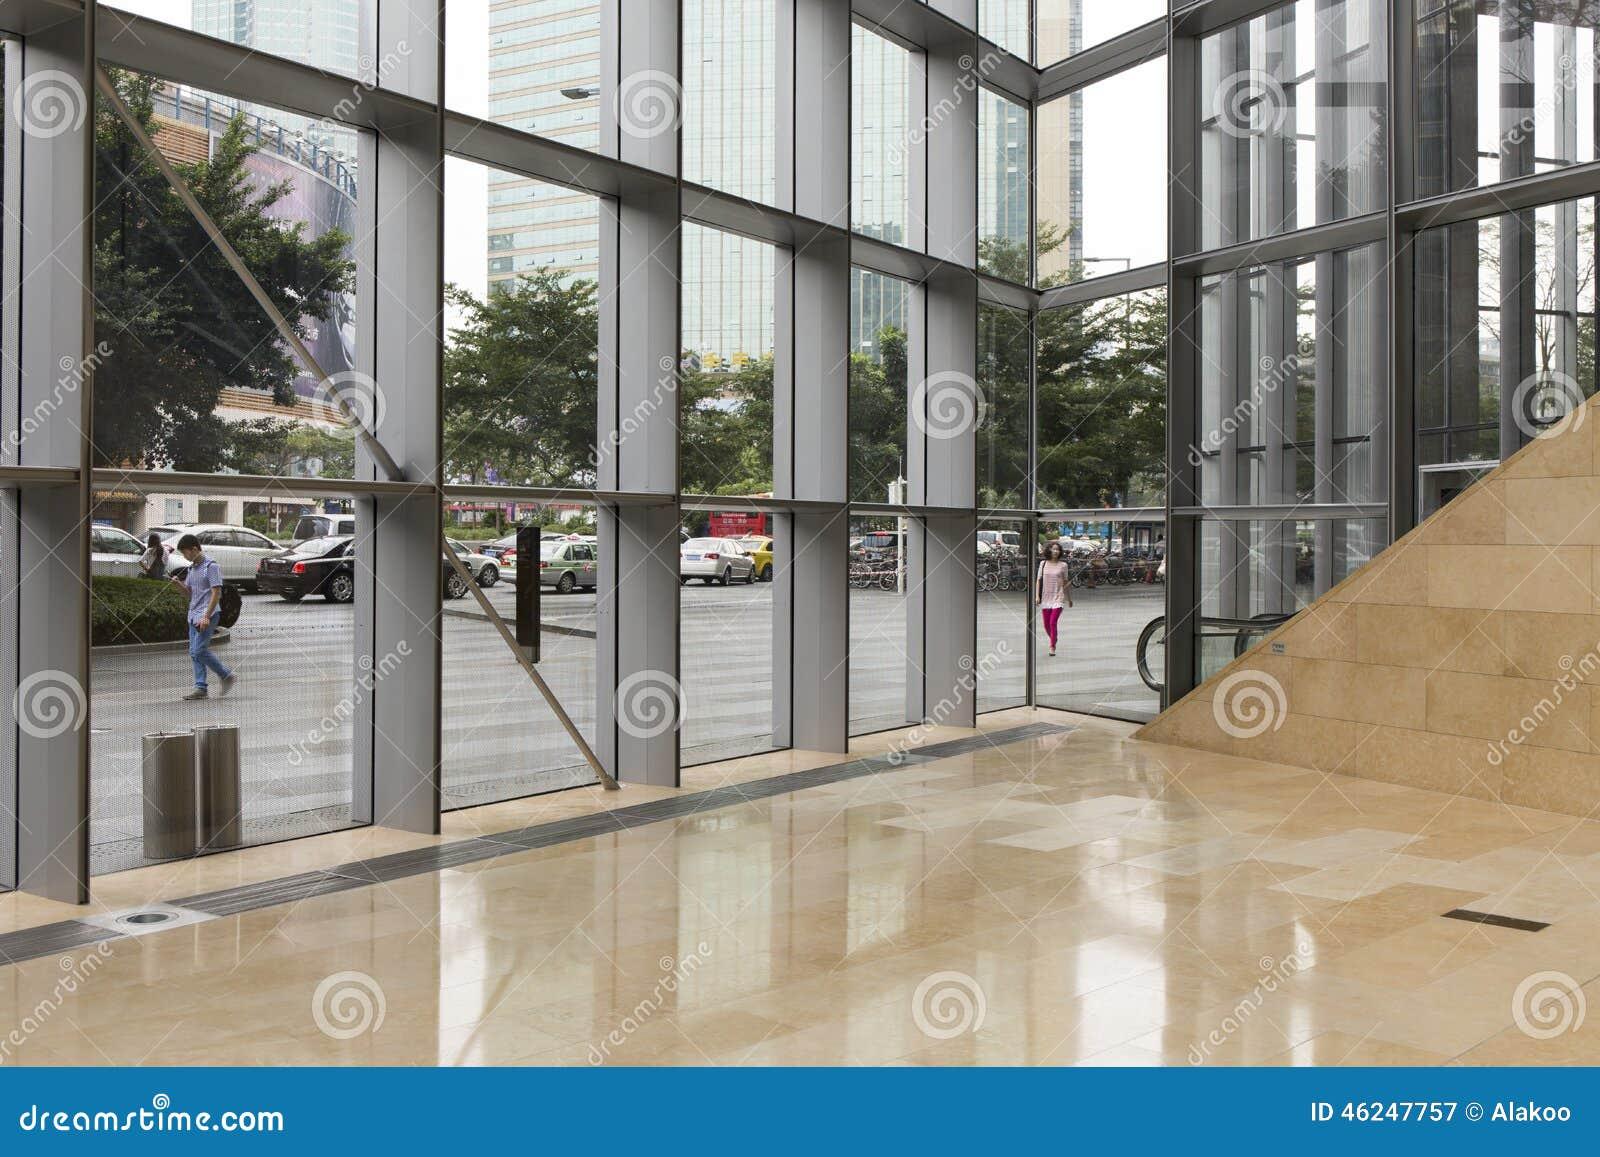 3571 Inside Modern Office Building. Interior Of Commercial Building With  Pic Of Commercial Office Doors